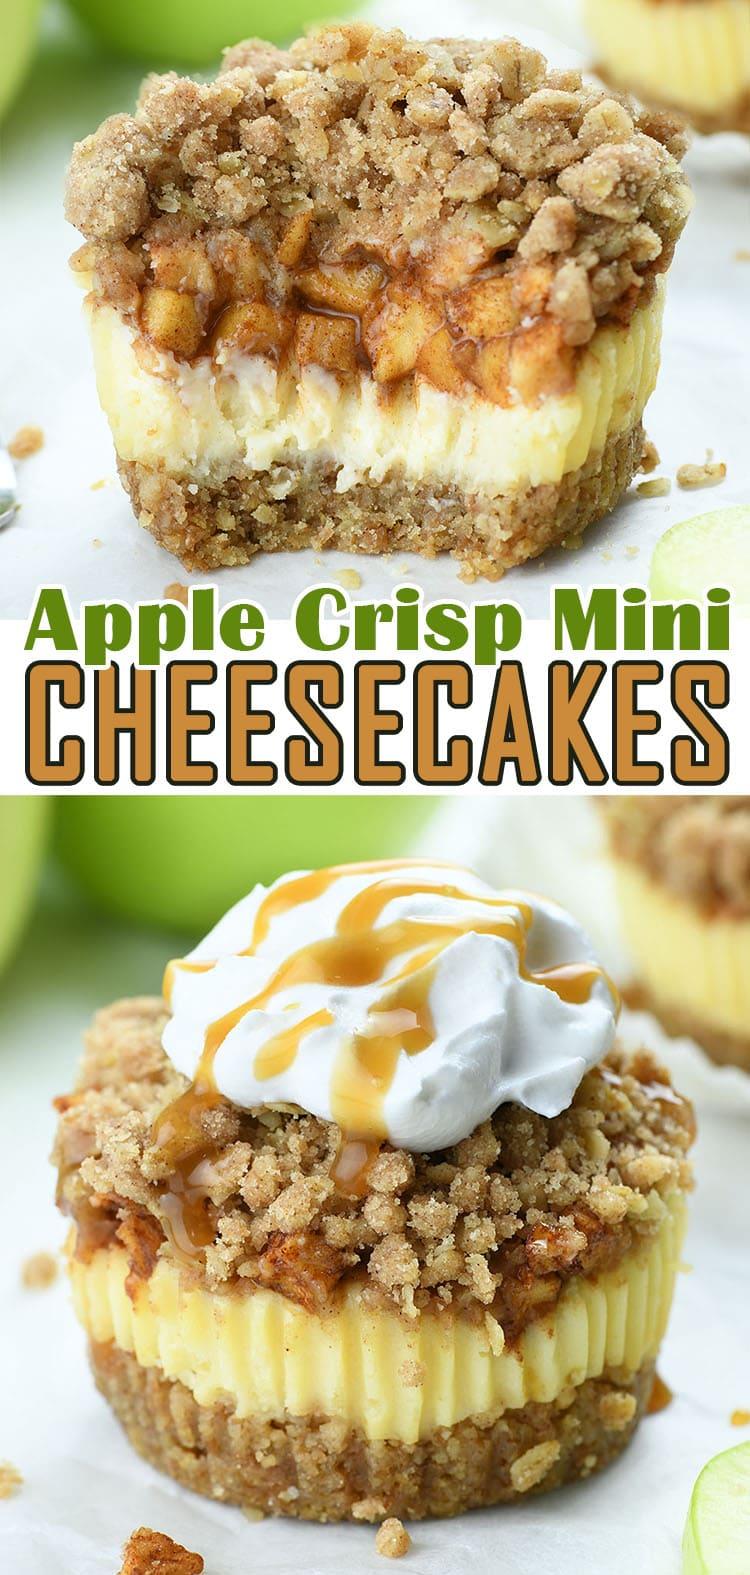 Apple Crisp Mini Cheesecakes